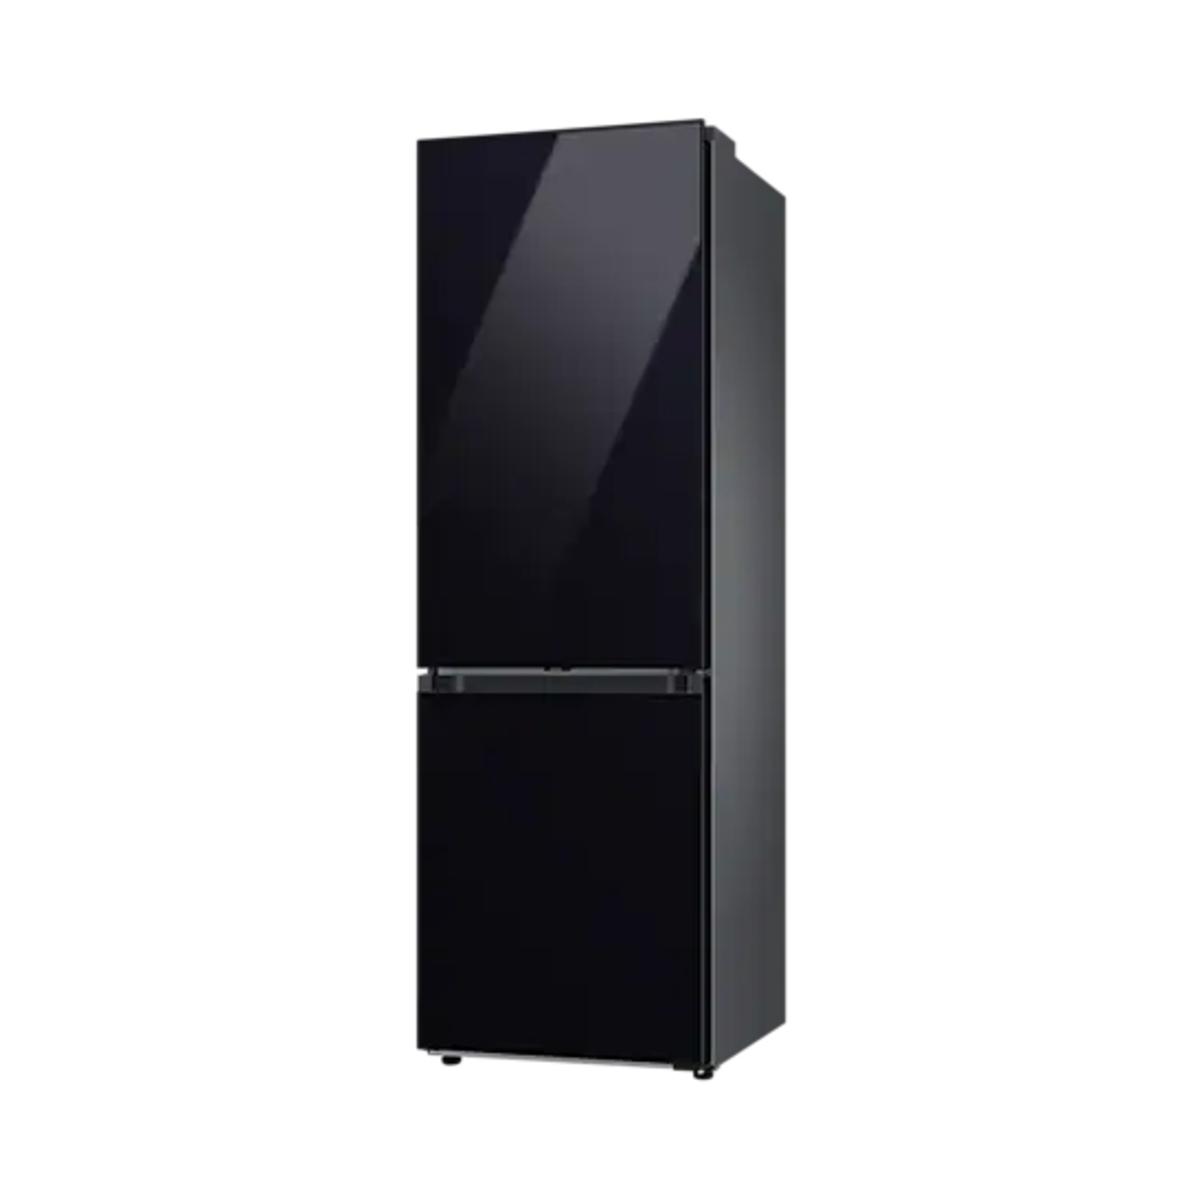 Samsung RB34A6B2E22/EU Bespoke 1.85m Fridge Freezer, Clean Black